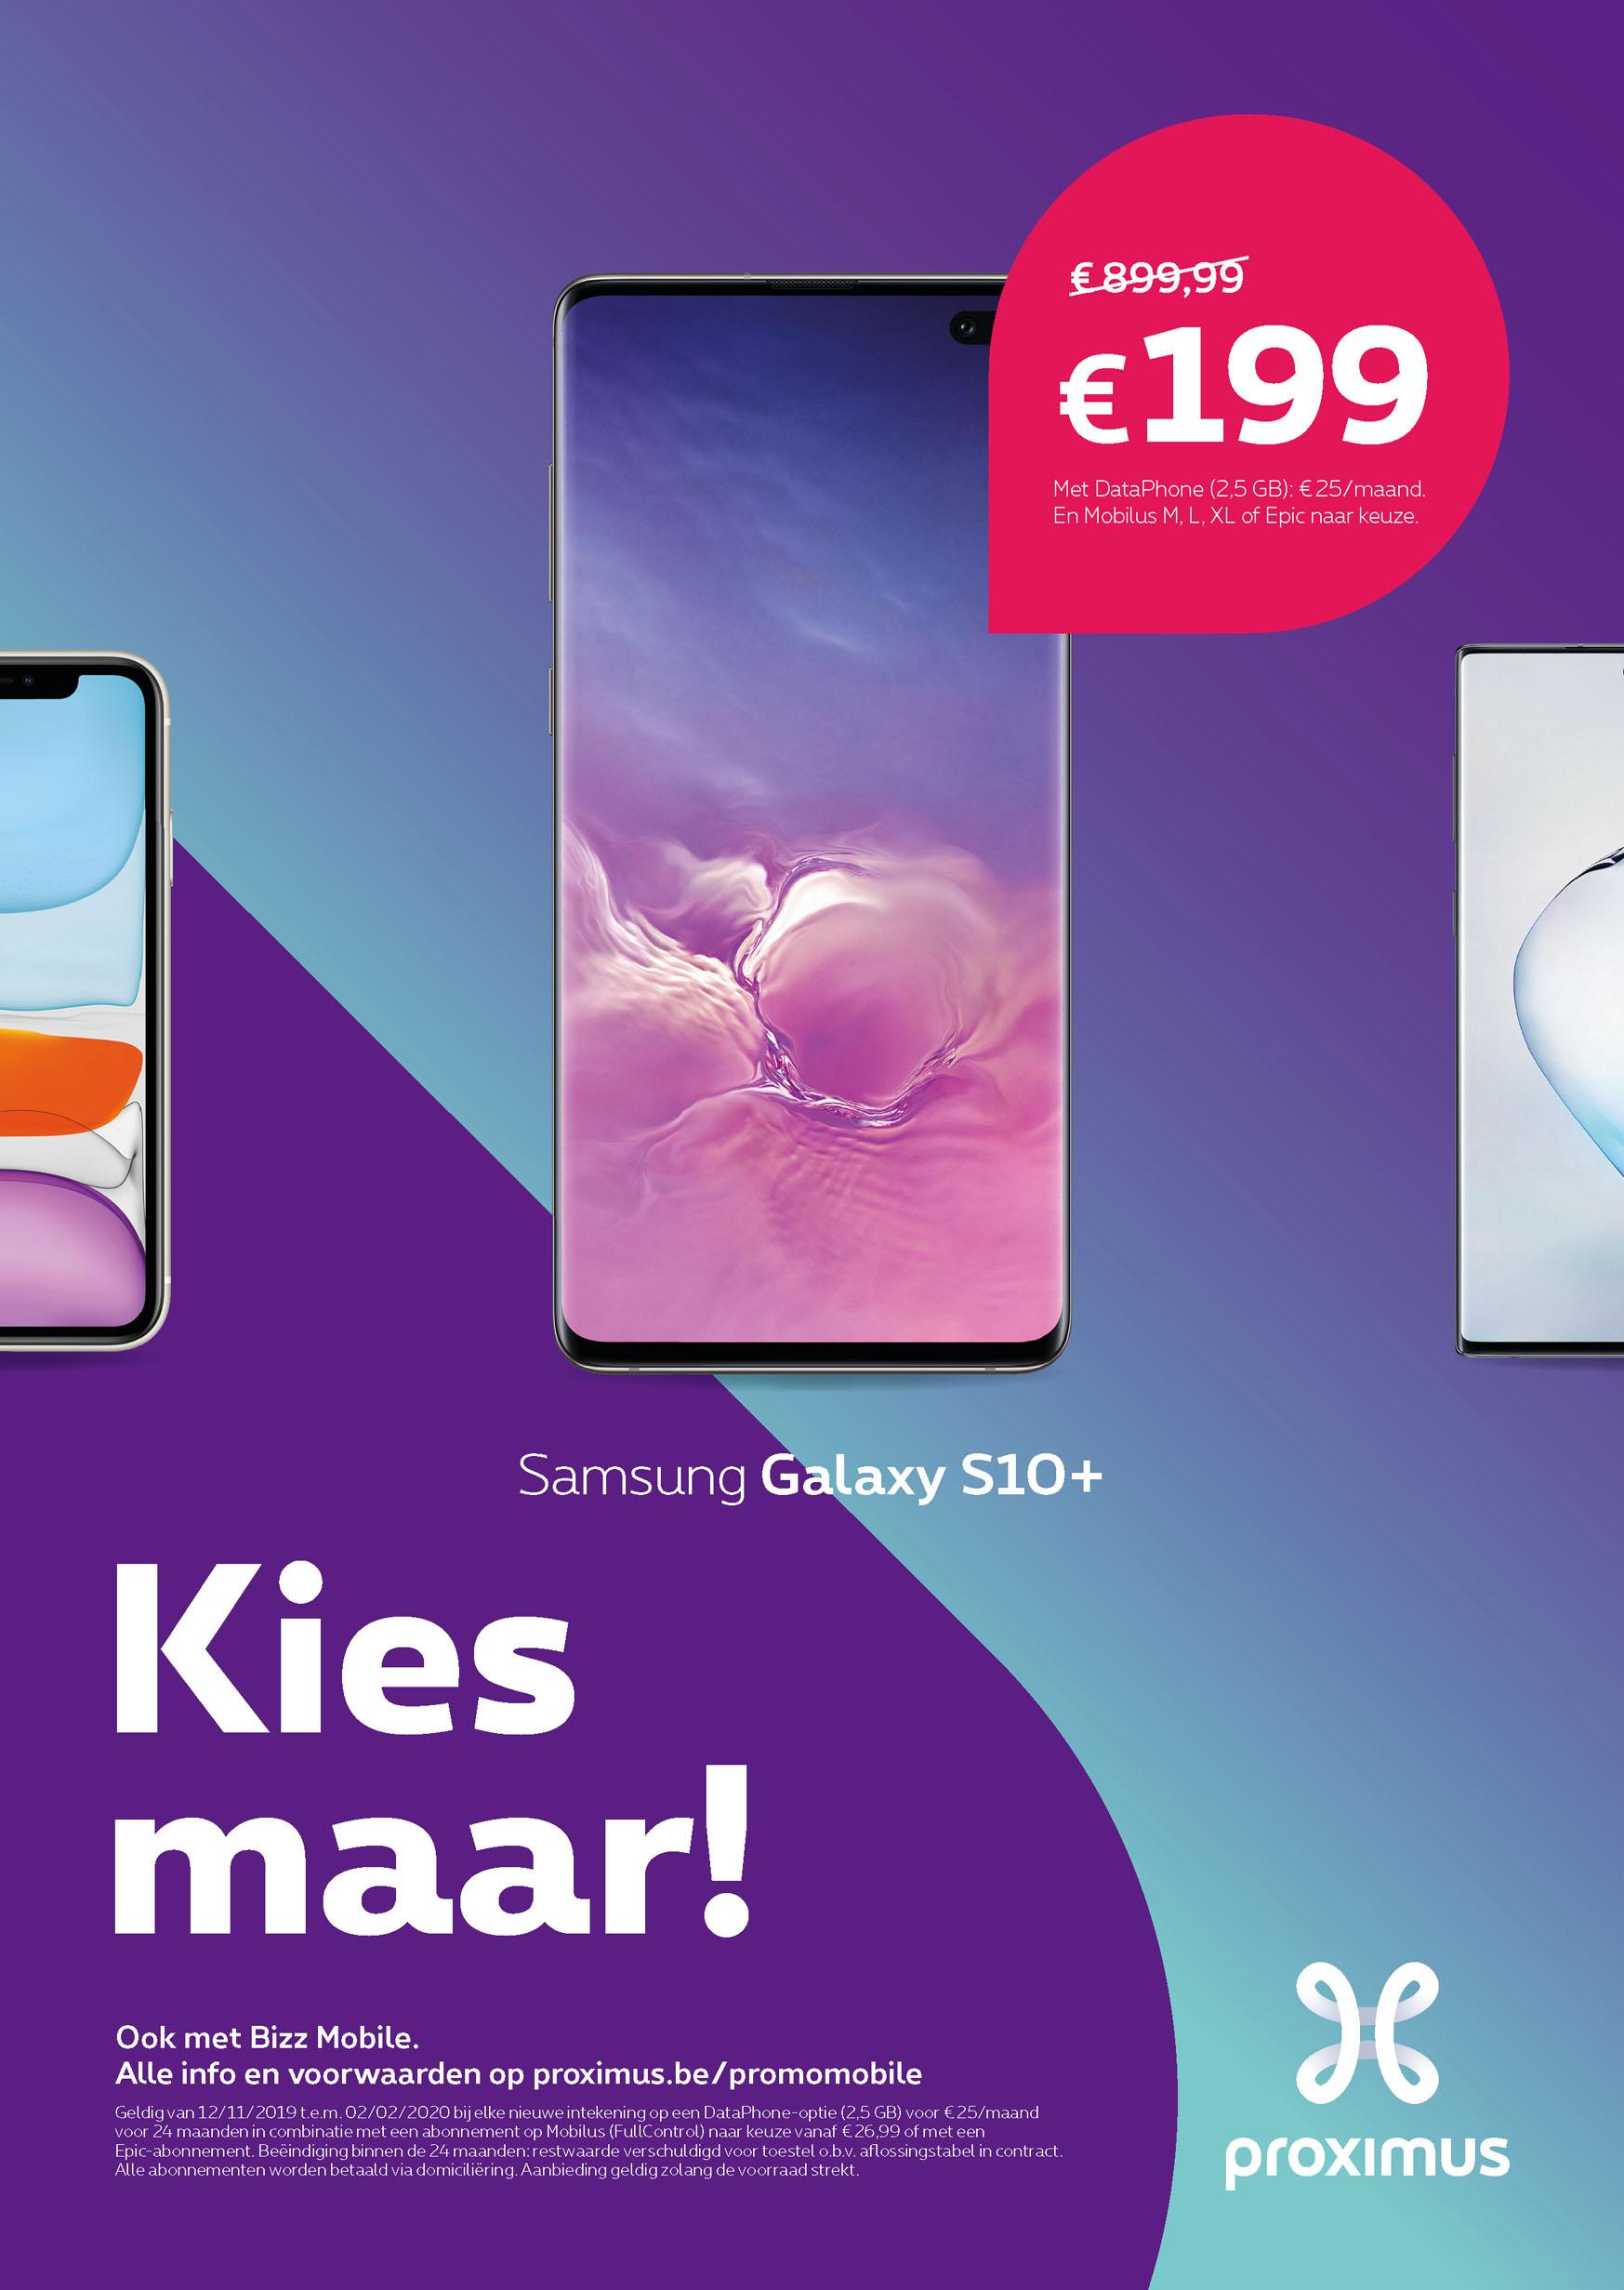 Promotions_JO_JO_Samsung_Galaxy_S10+_201